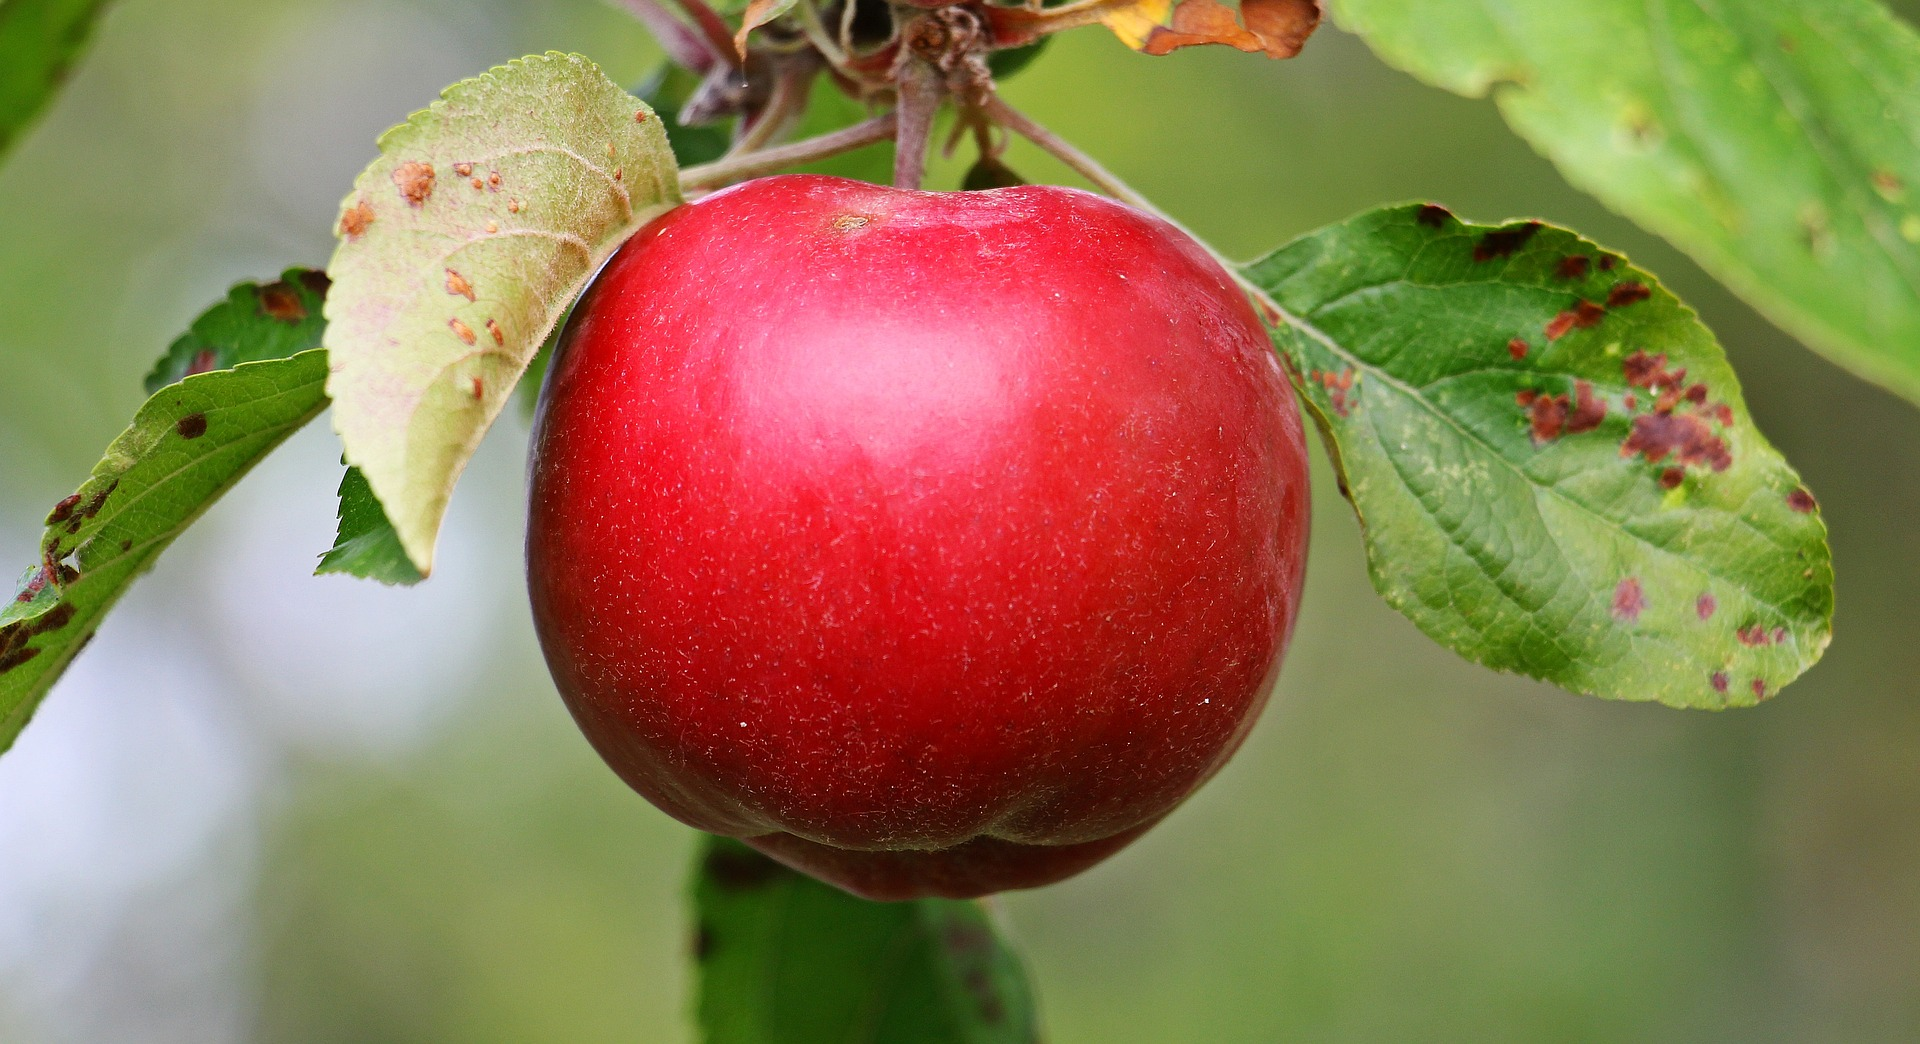 Kunskapens äpple